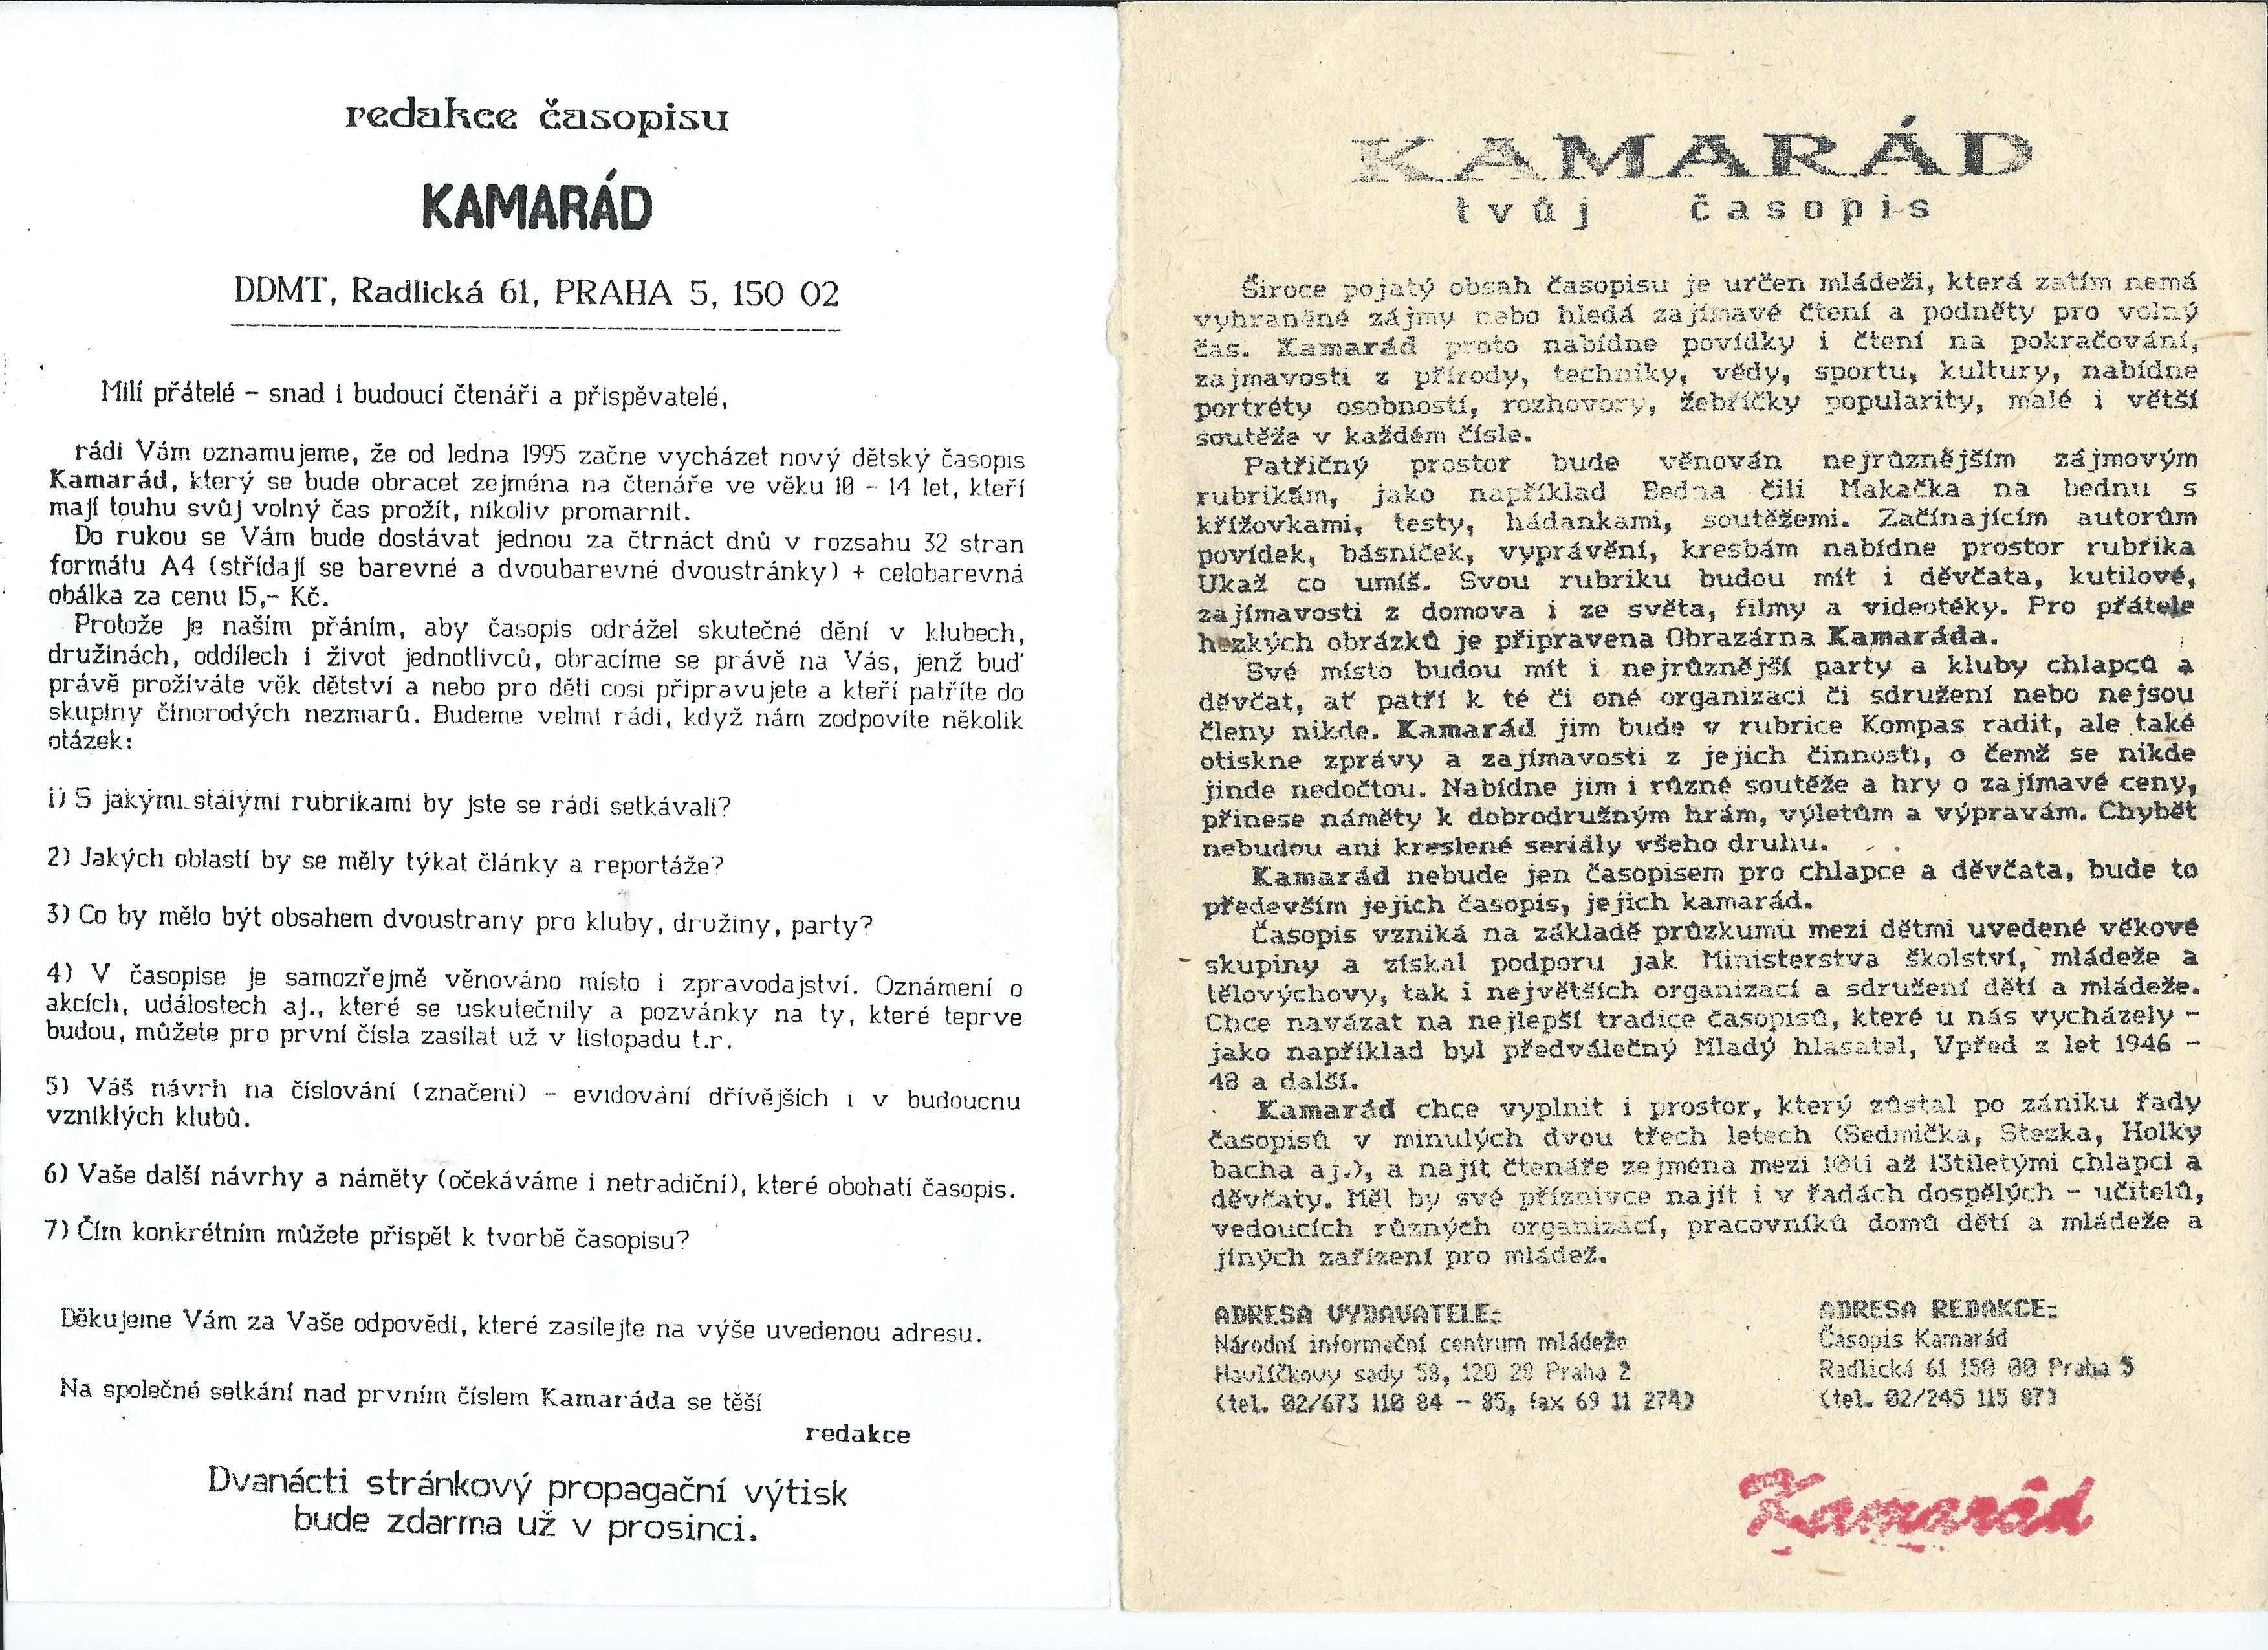 KAMARAD_0.rocnik_(1994)_letaky